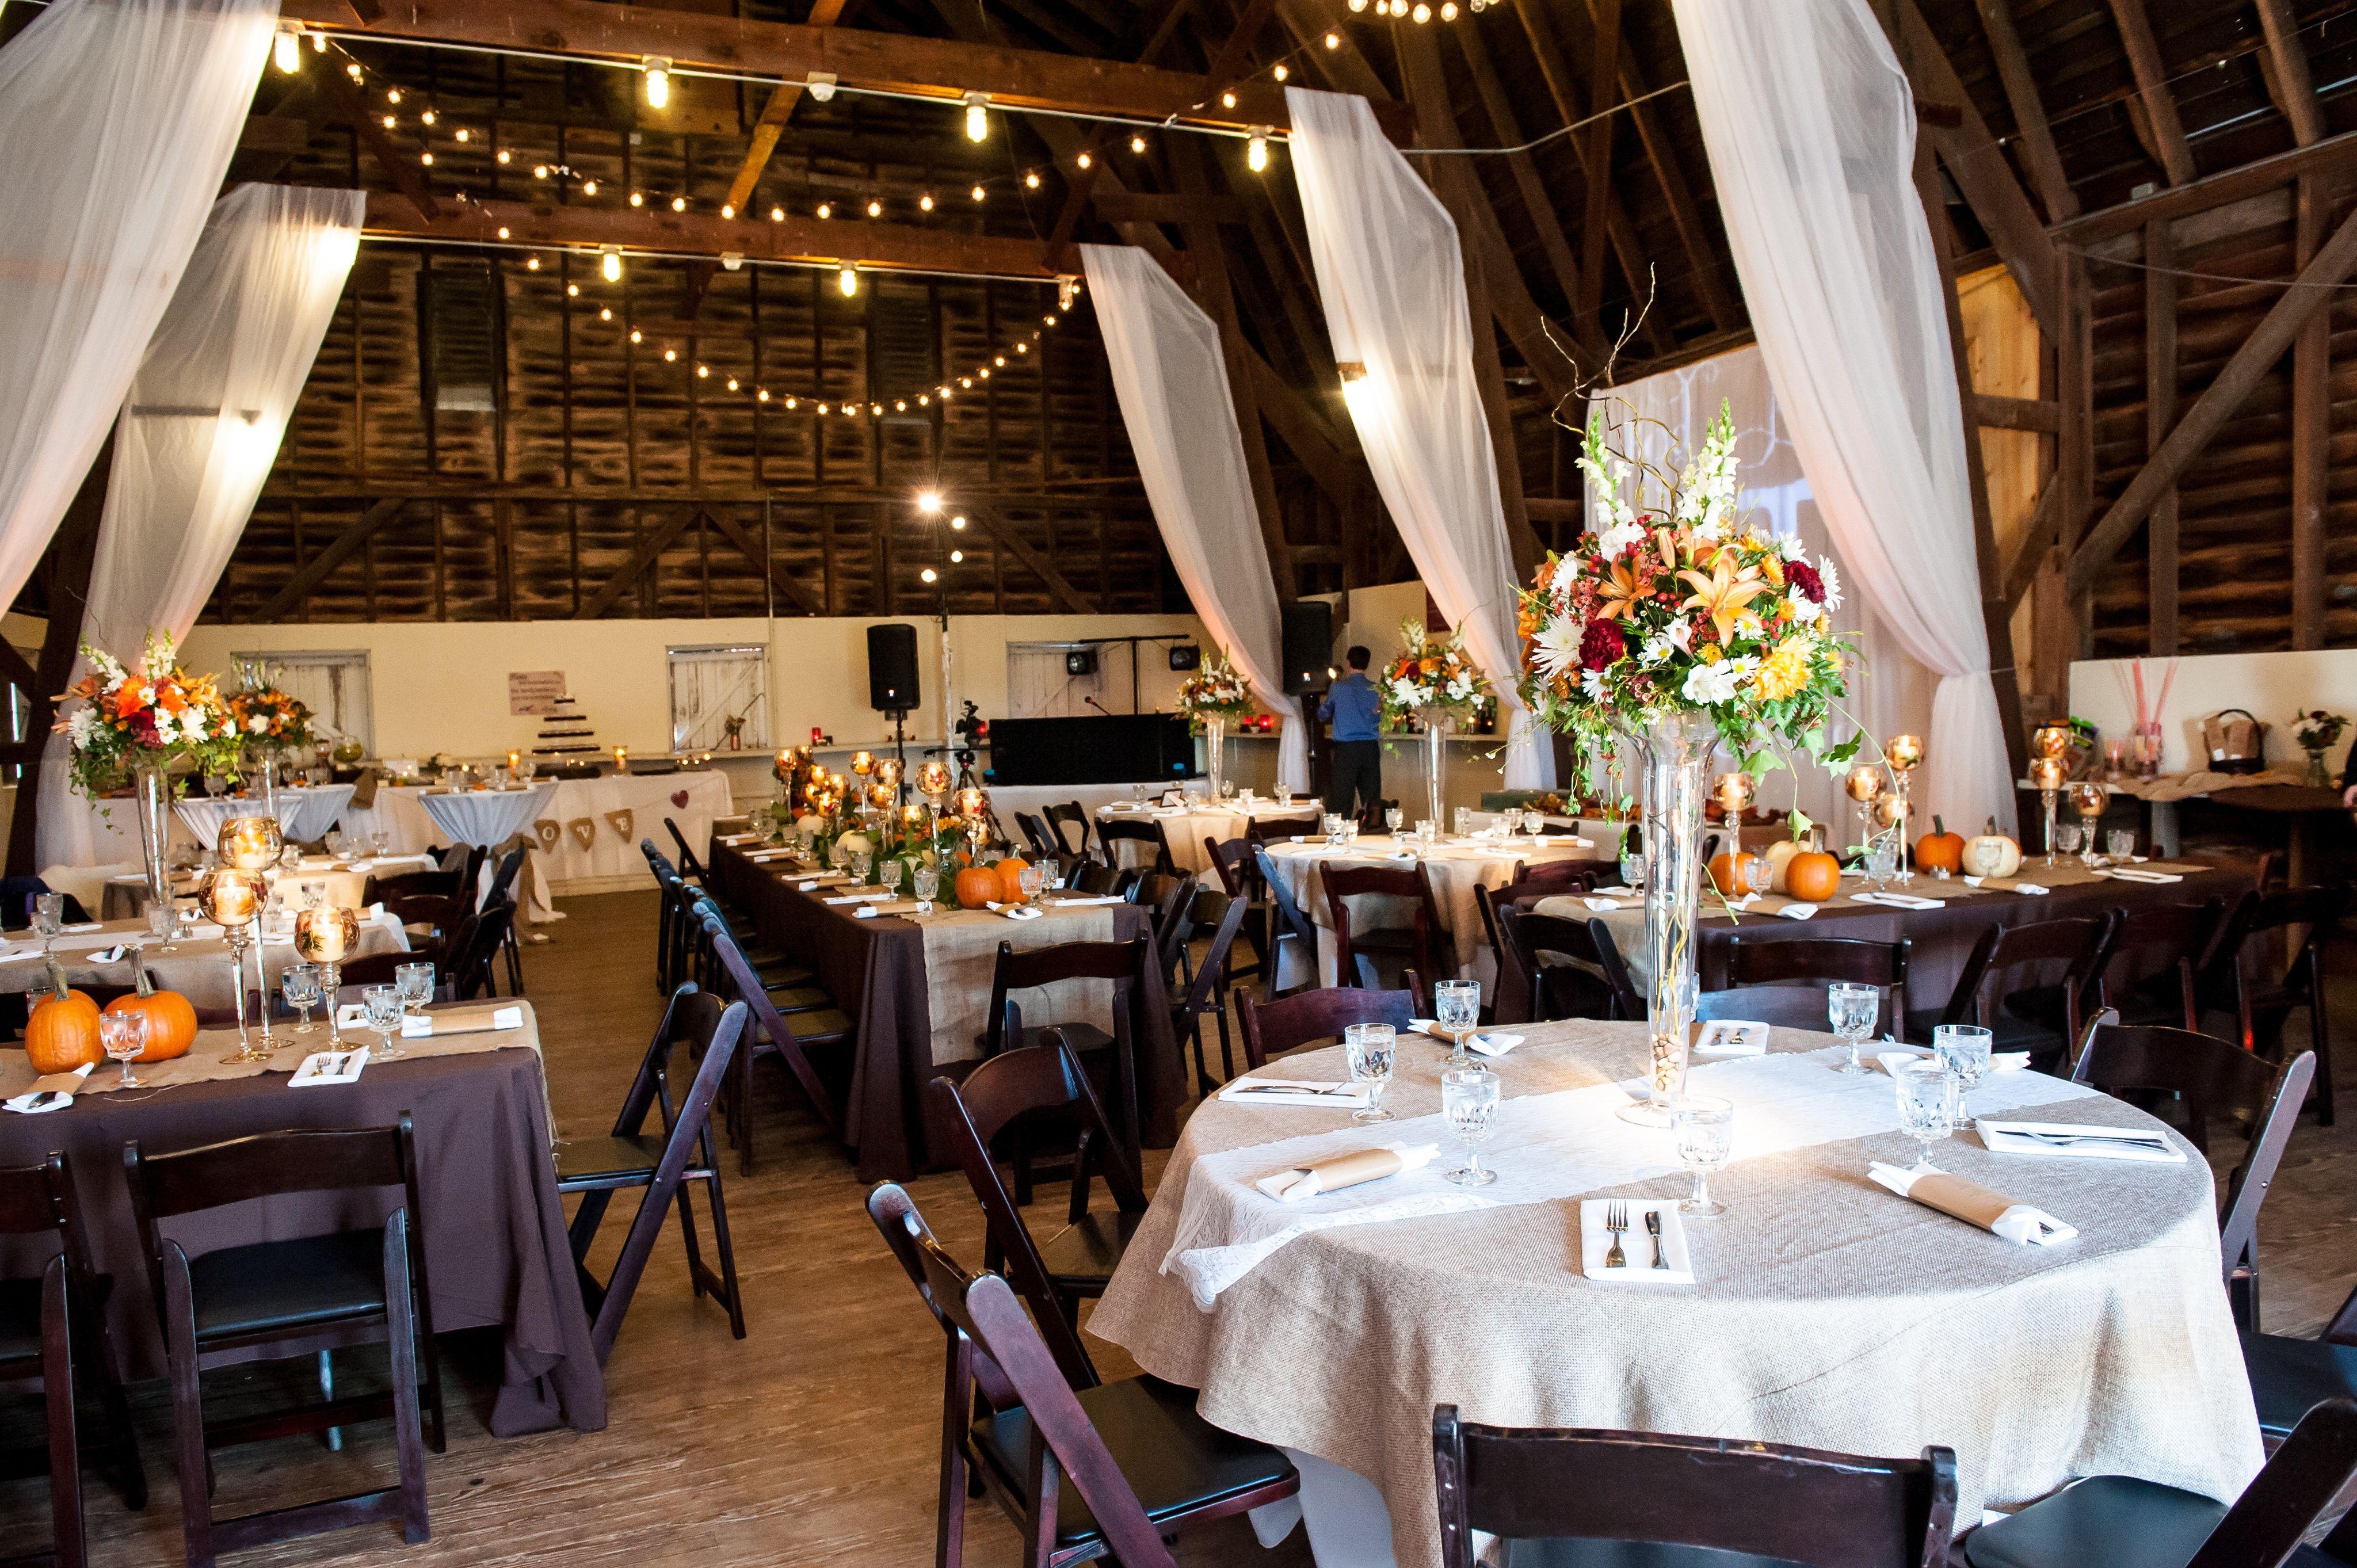 663d80f1b68f50b7d960c3d8e5d4ede6 - the tea barn at fair hill wedding